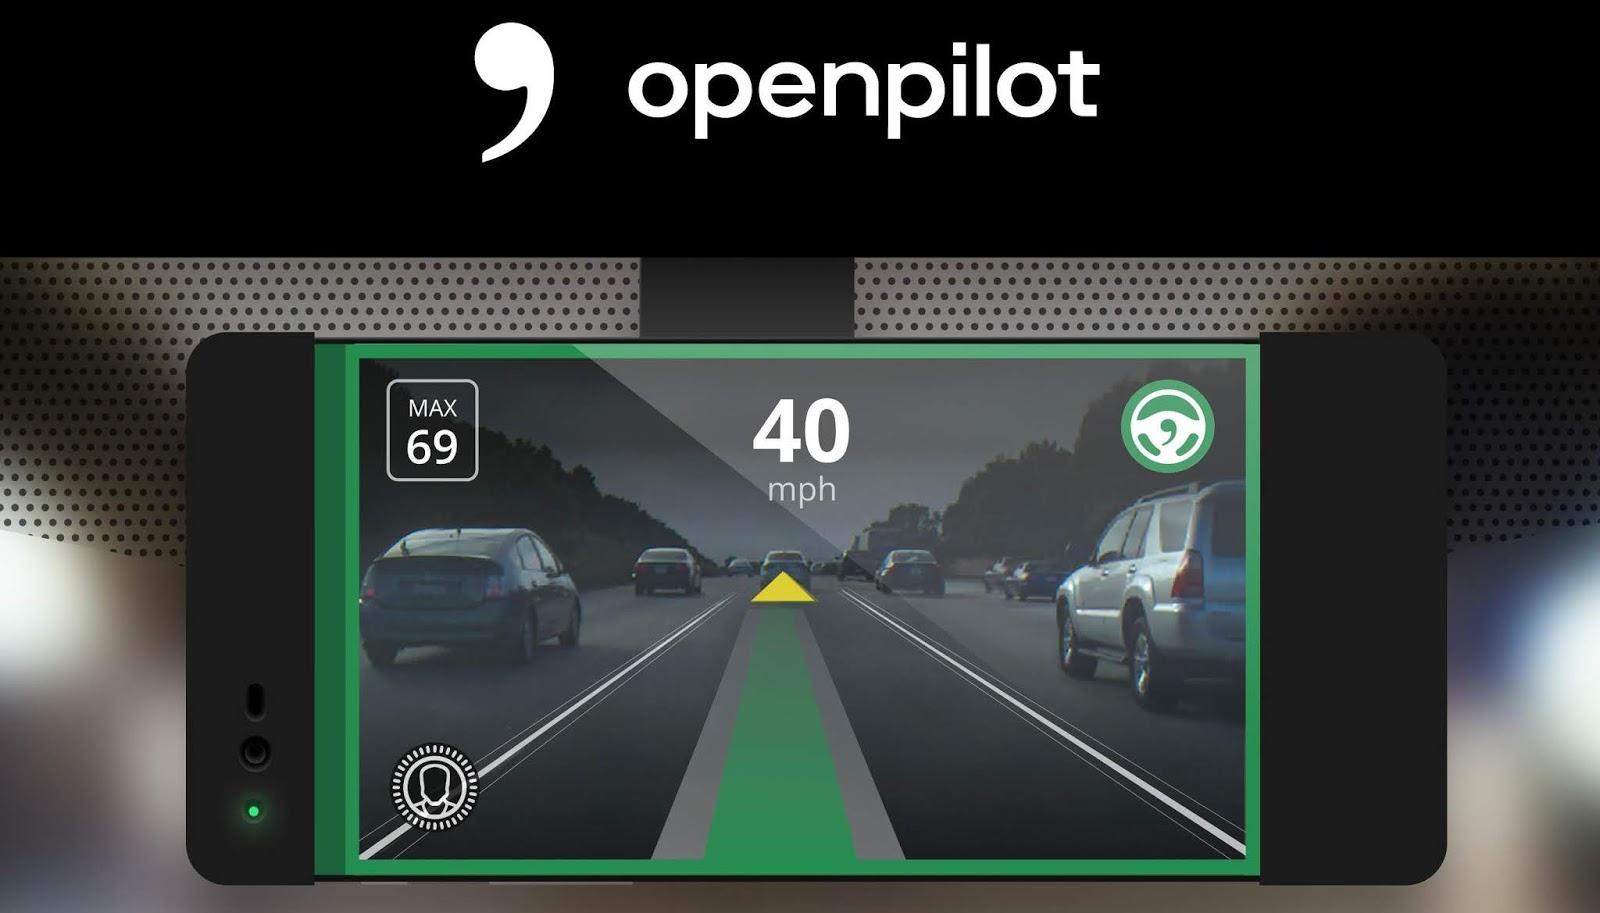 opensource autopilot system